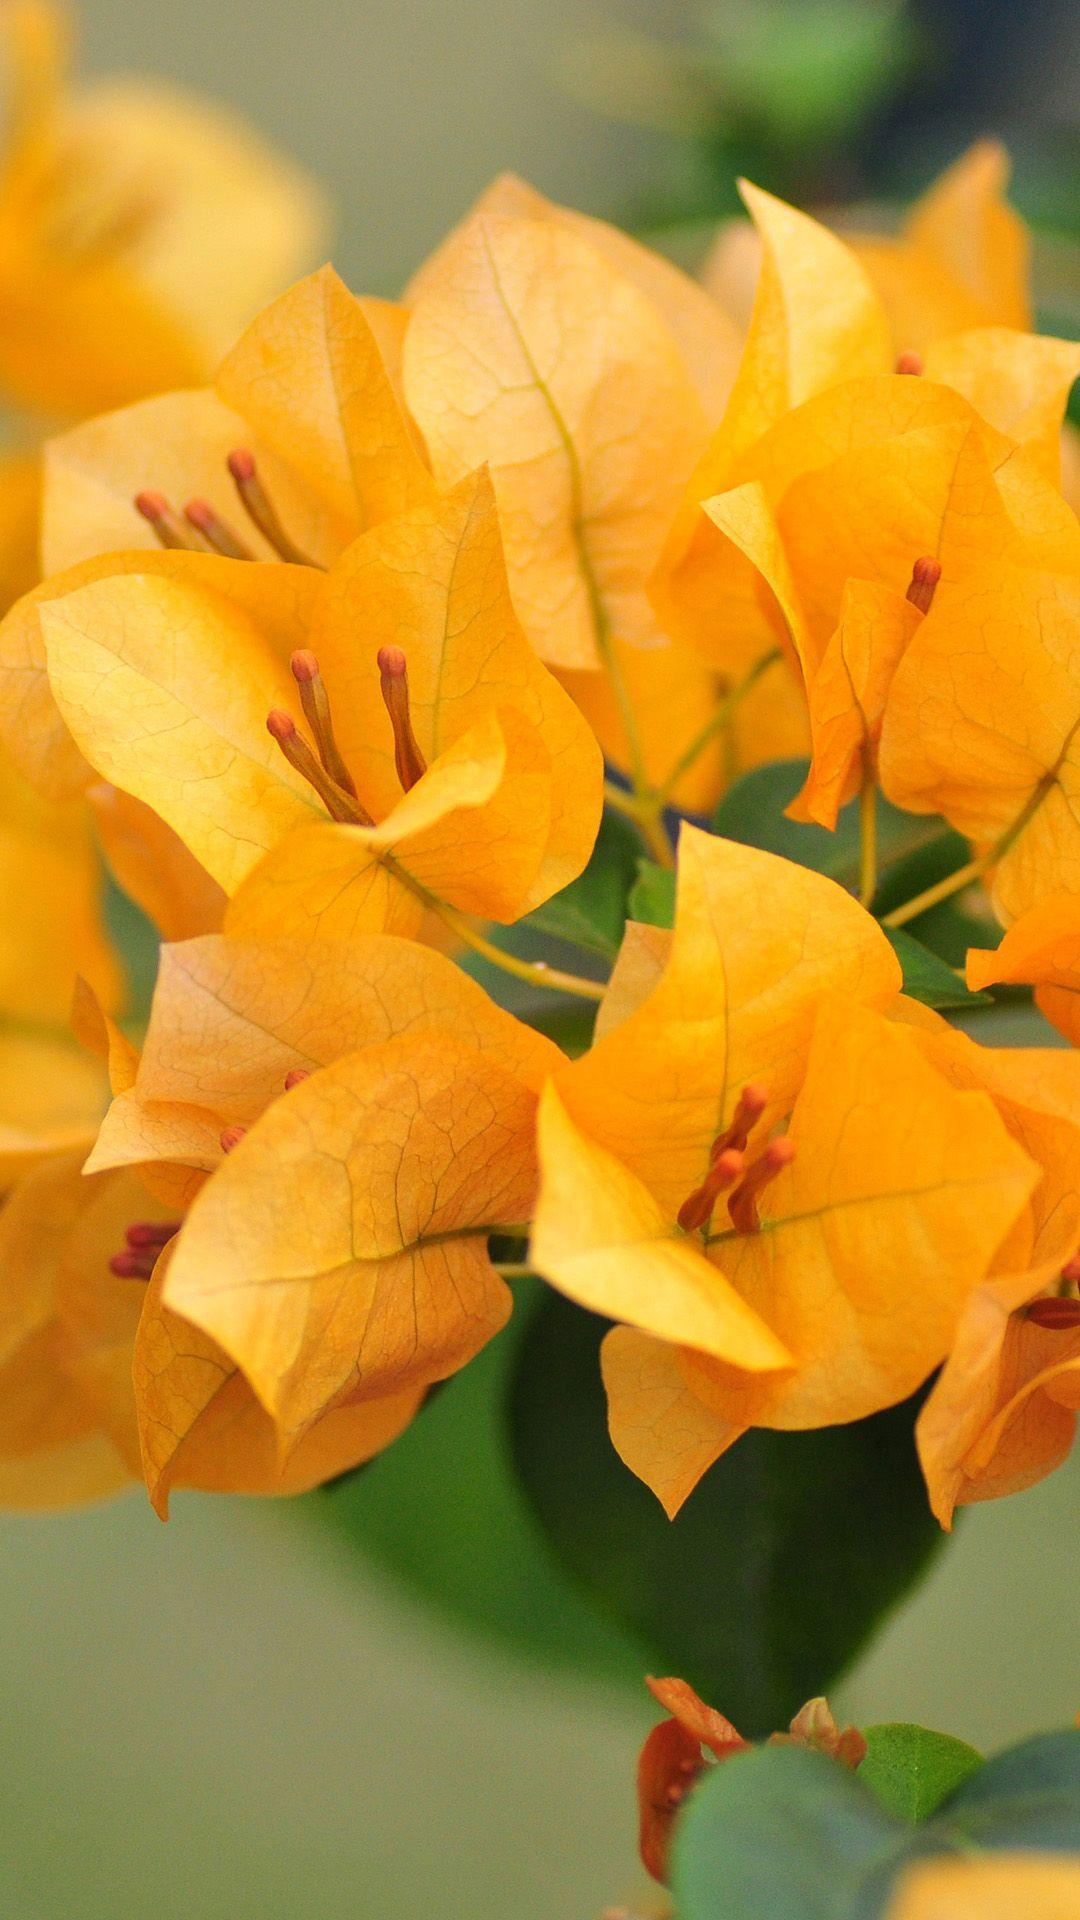 Plus Yellow Wallpaper iPhone 6 Bing images